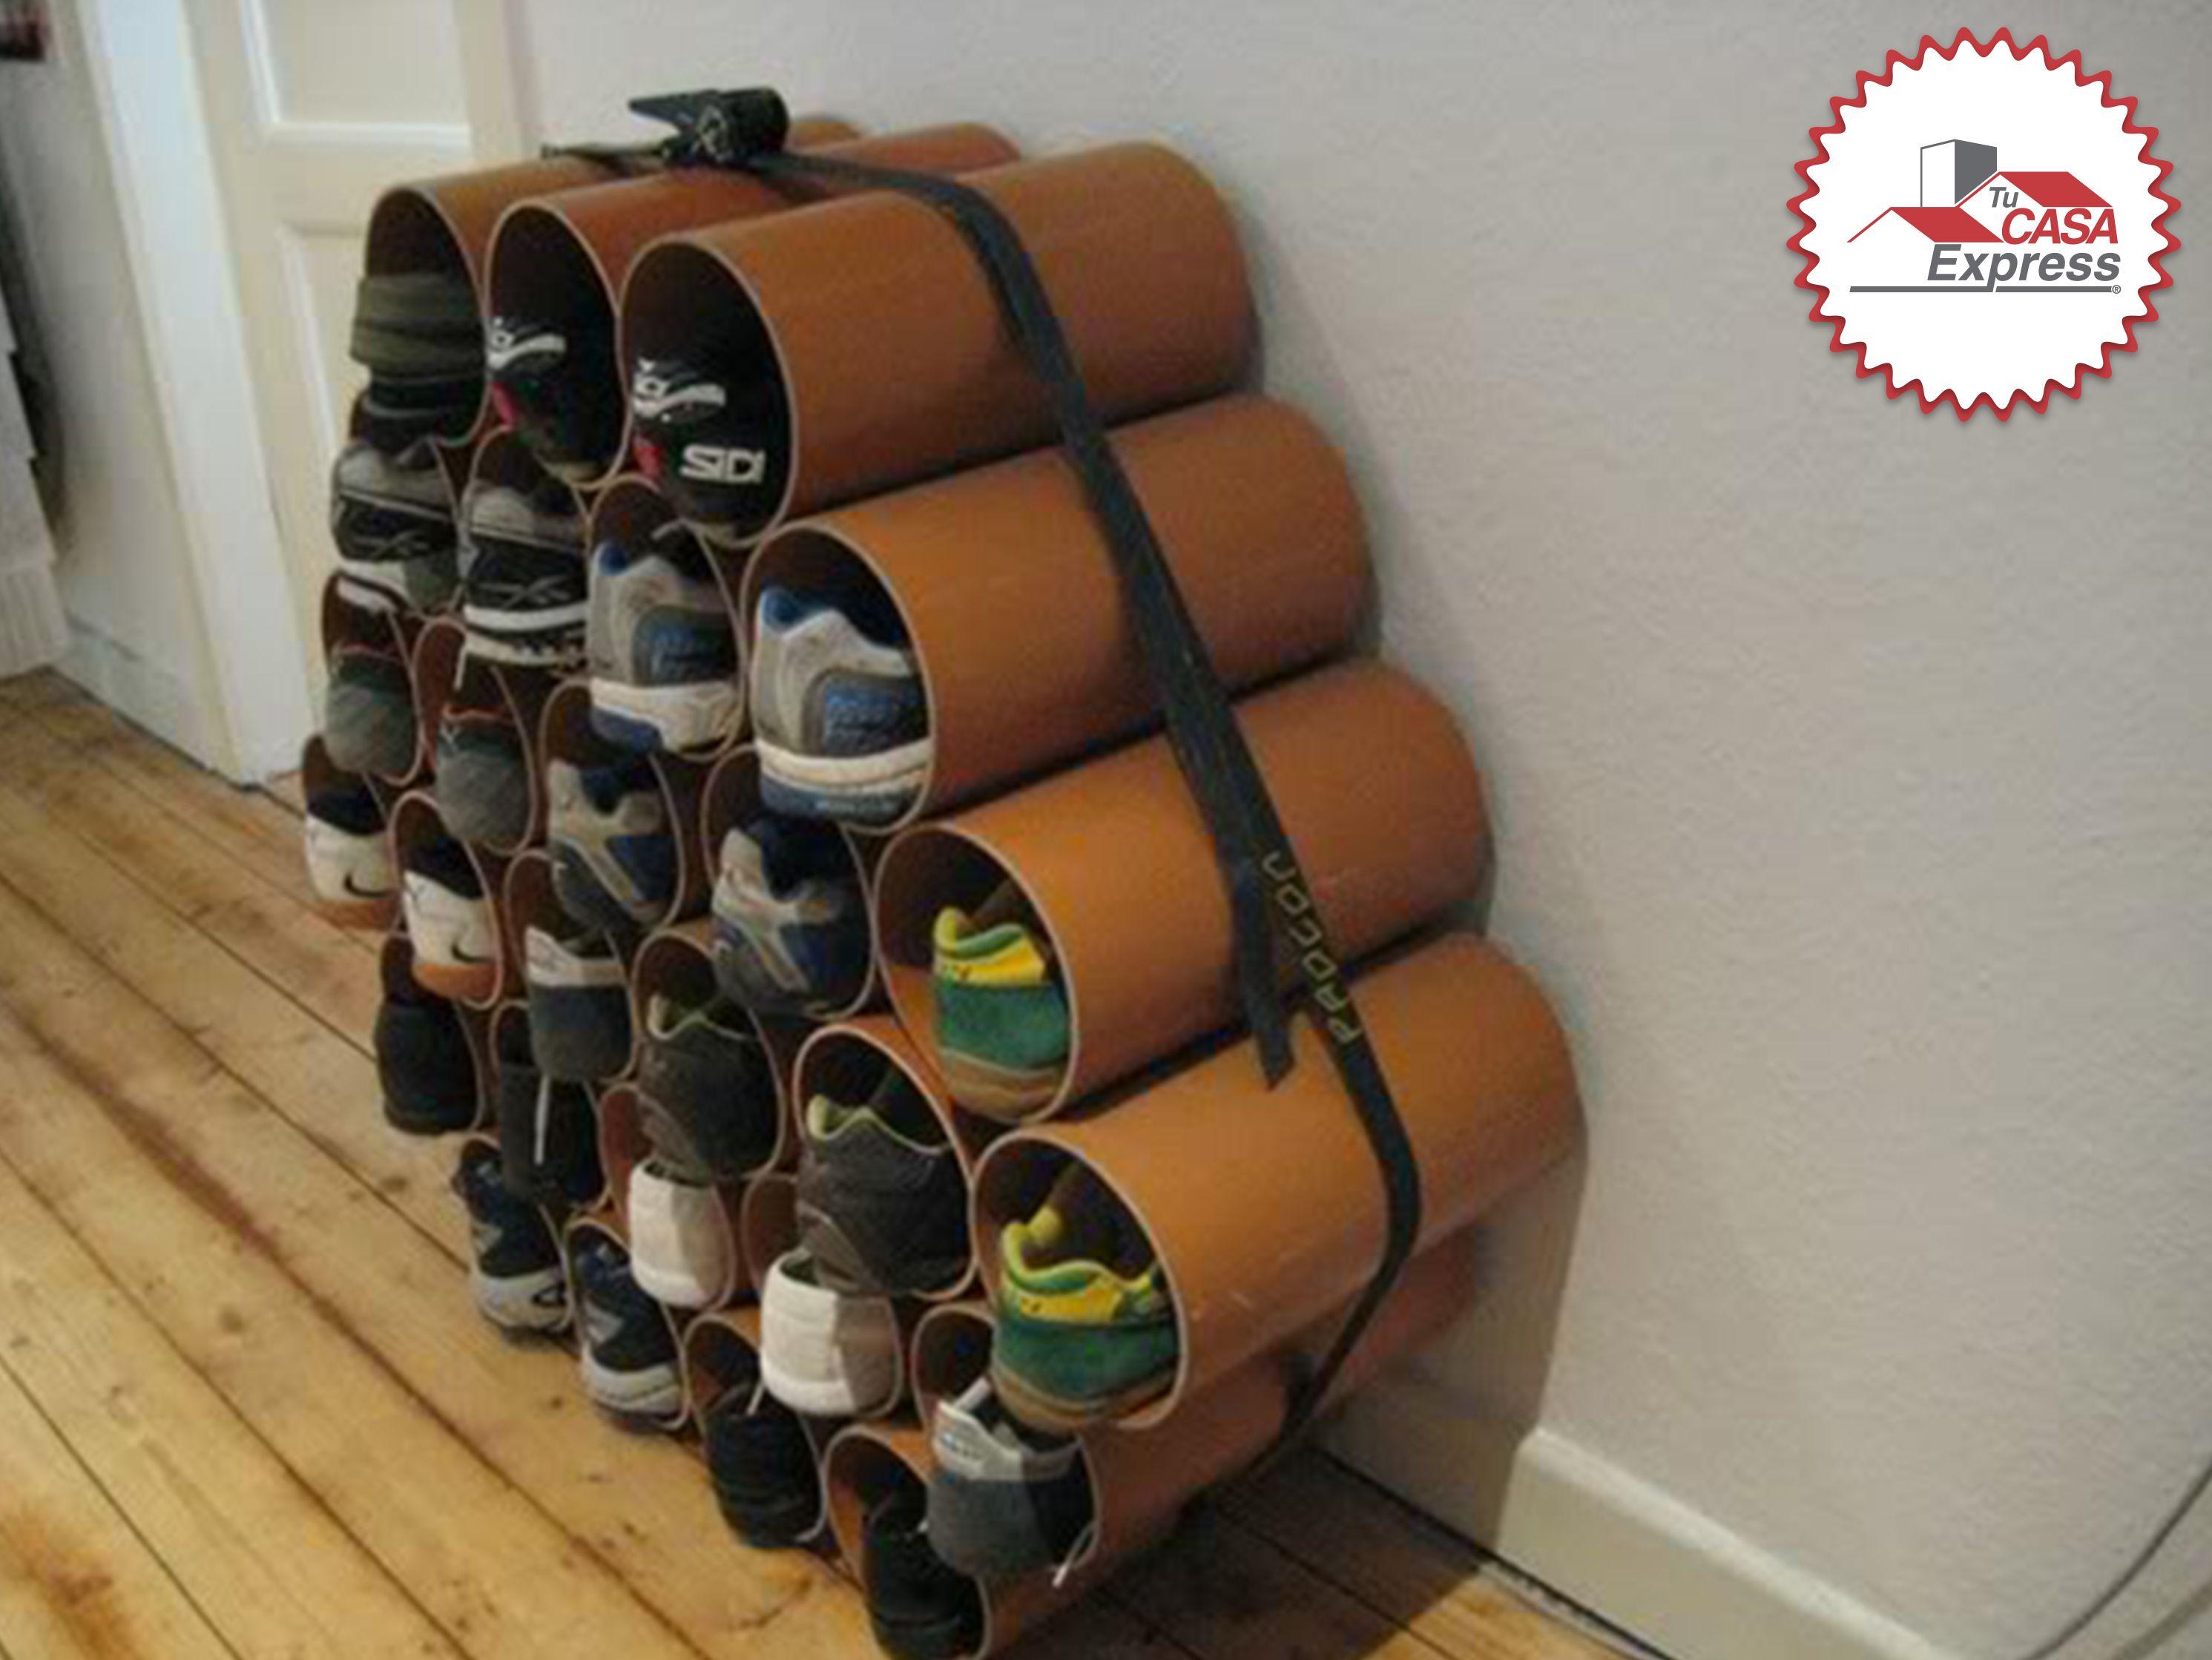 DIY Un zapatero elaborado con tubos de cart³n